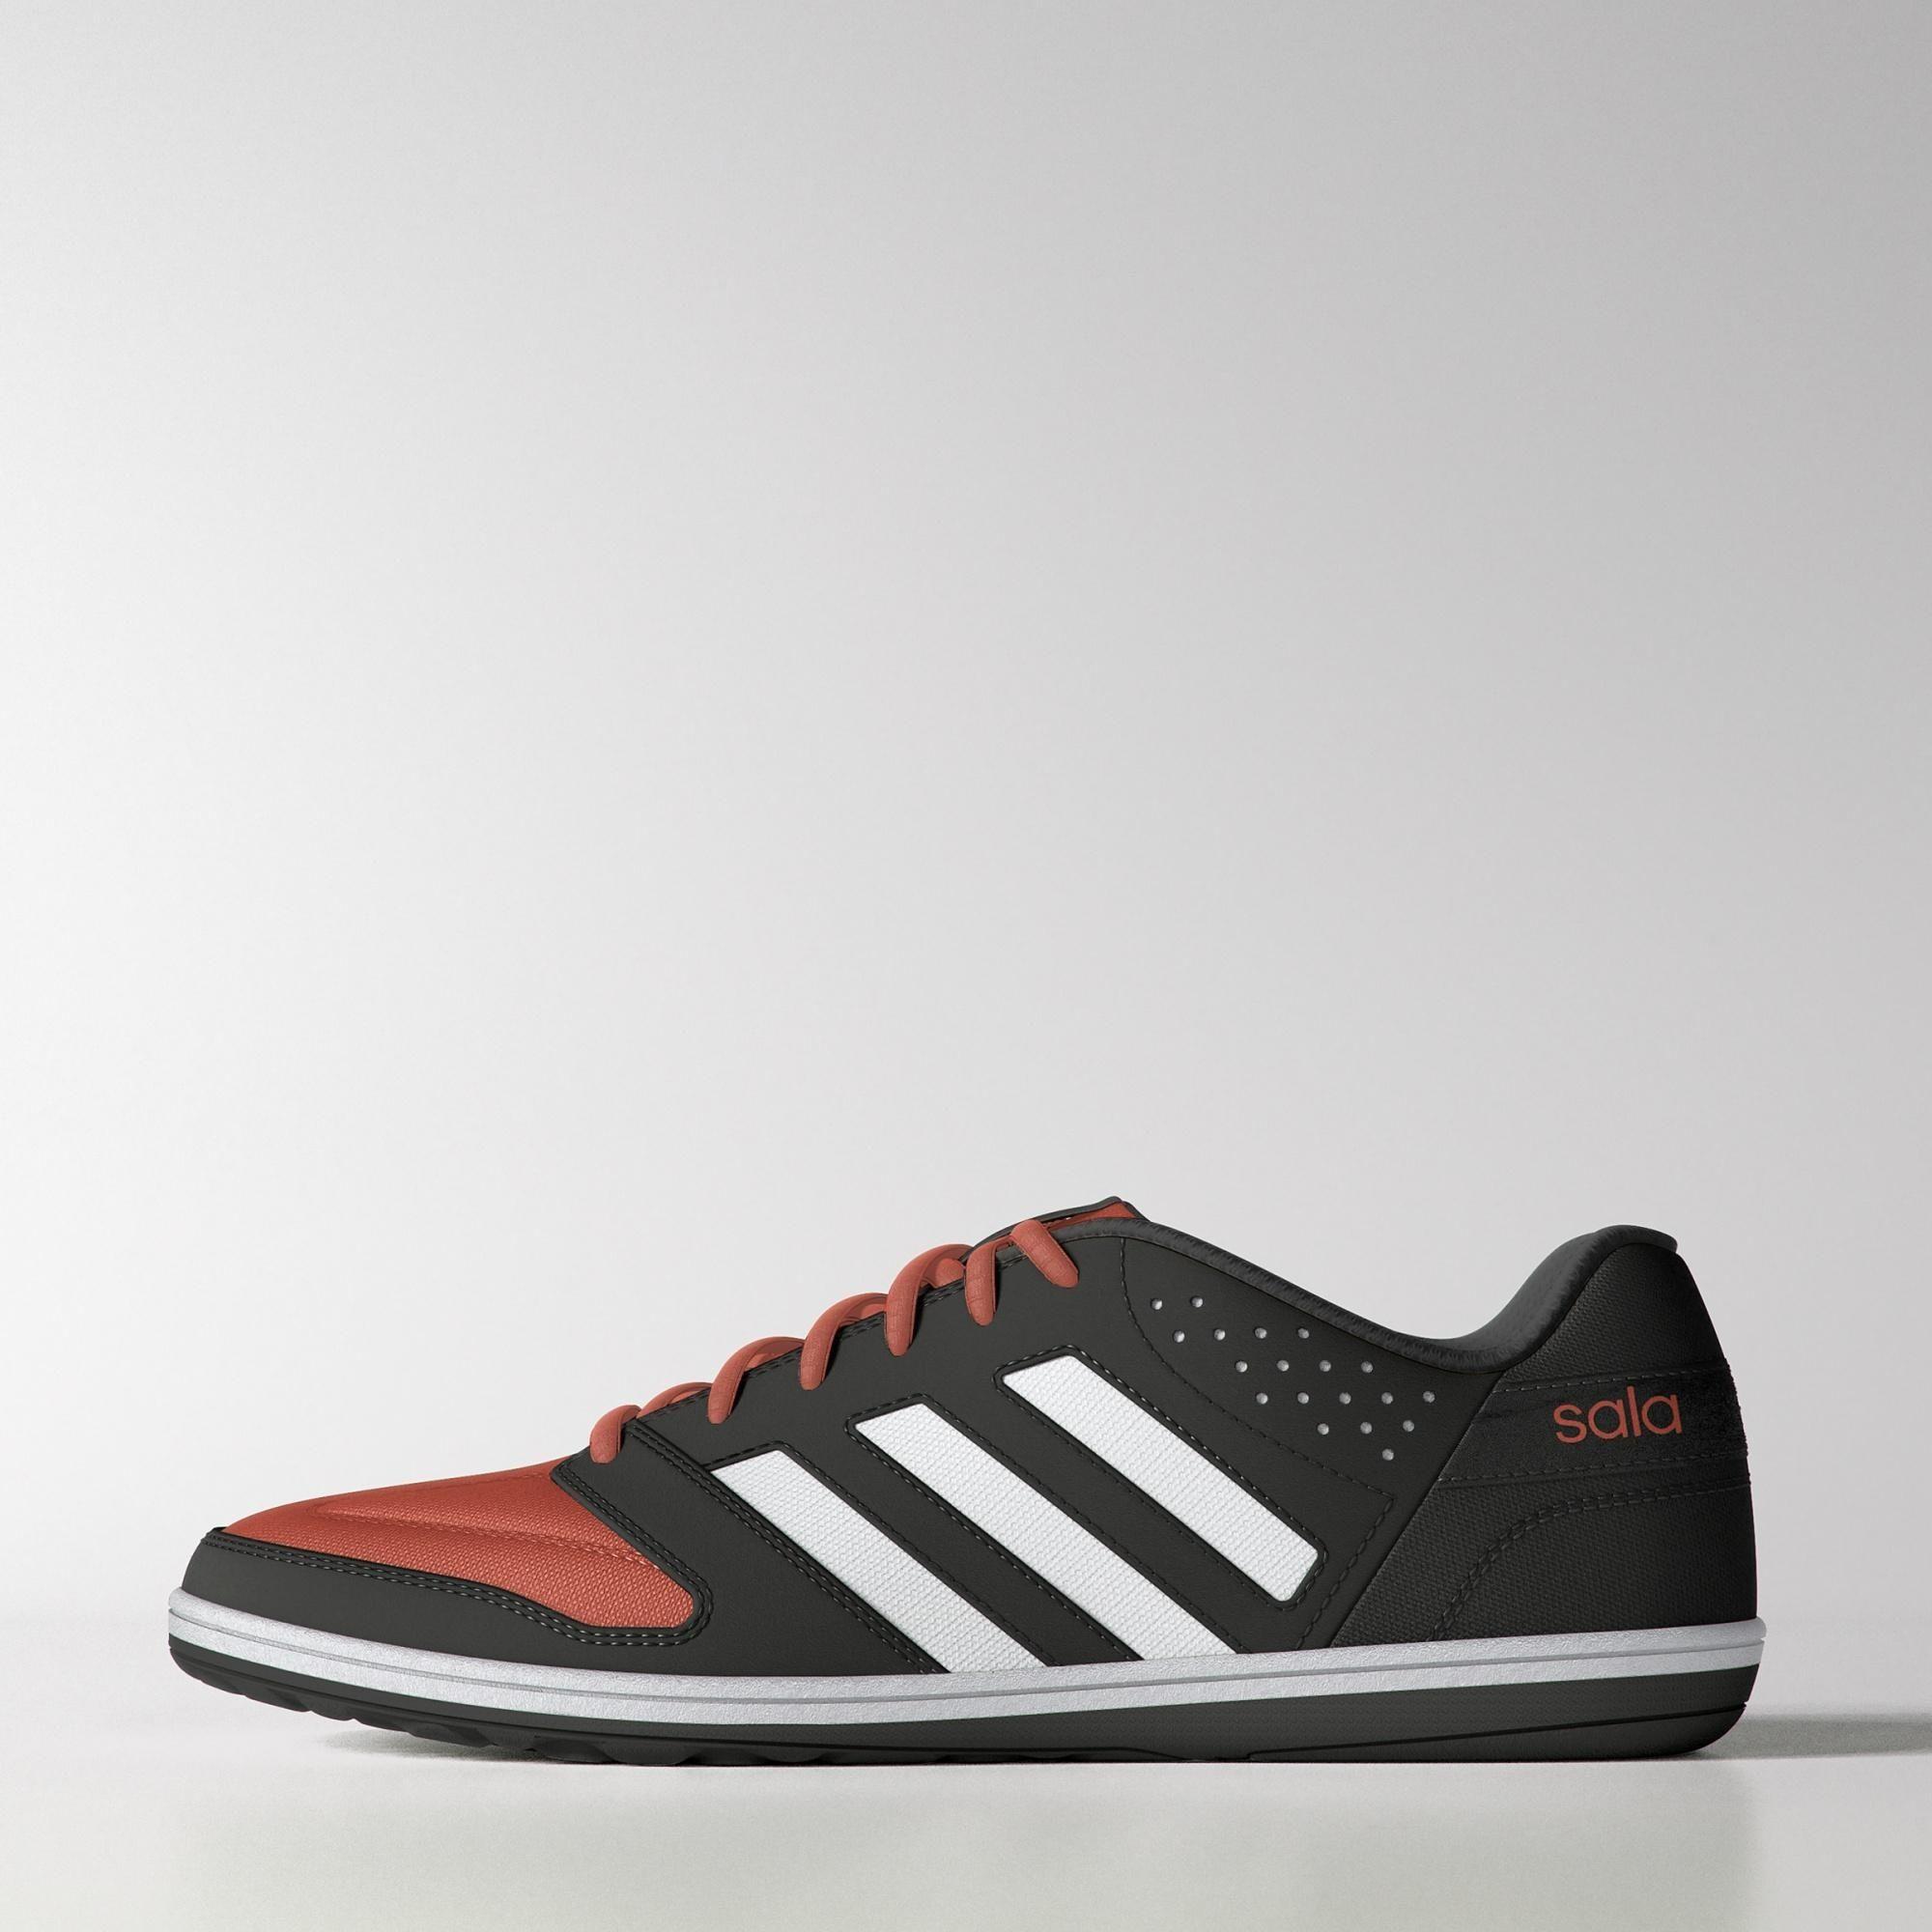 Adidas Freefootball Janeirinha Sala Shoes